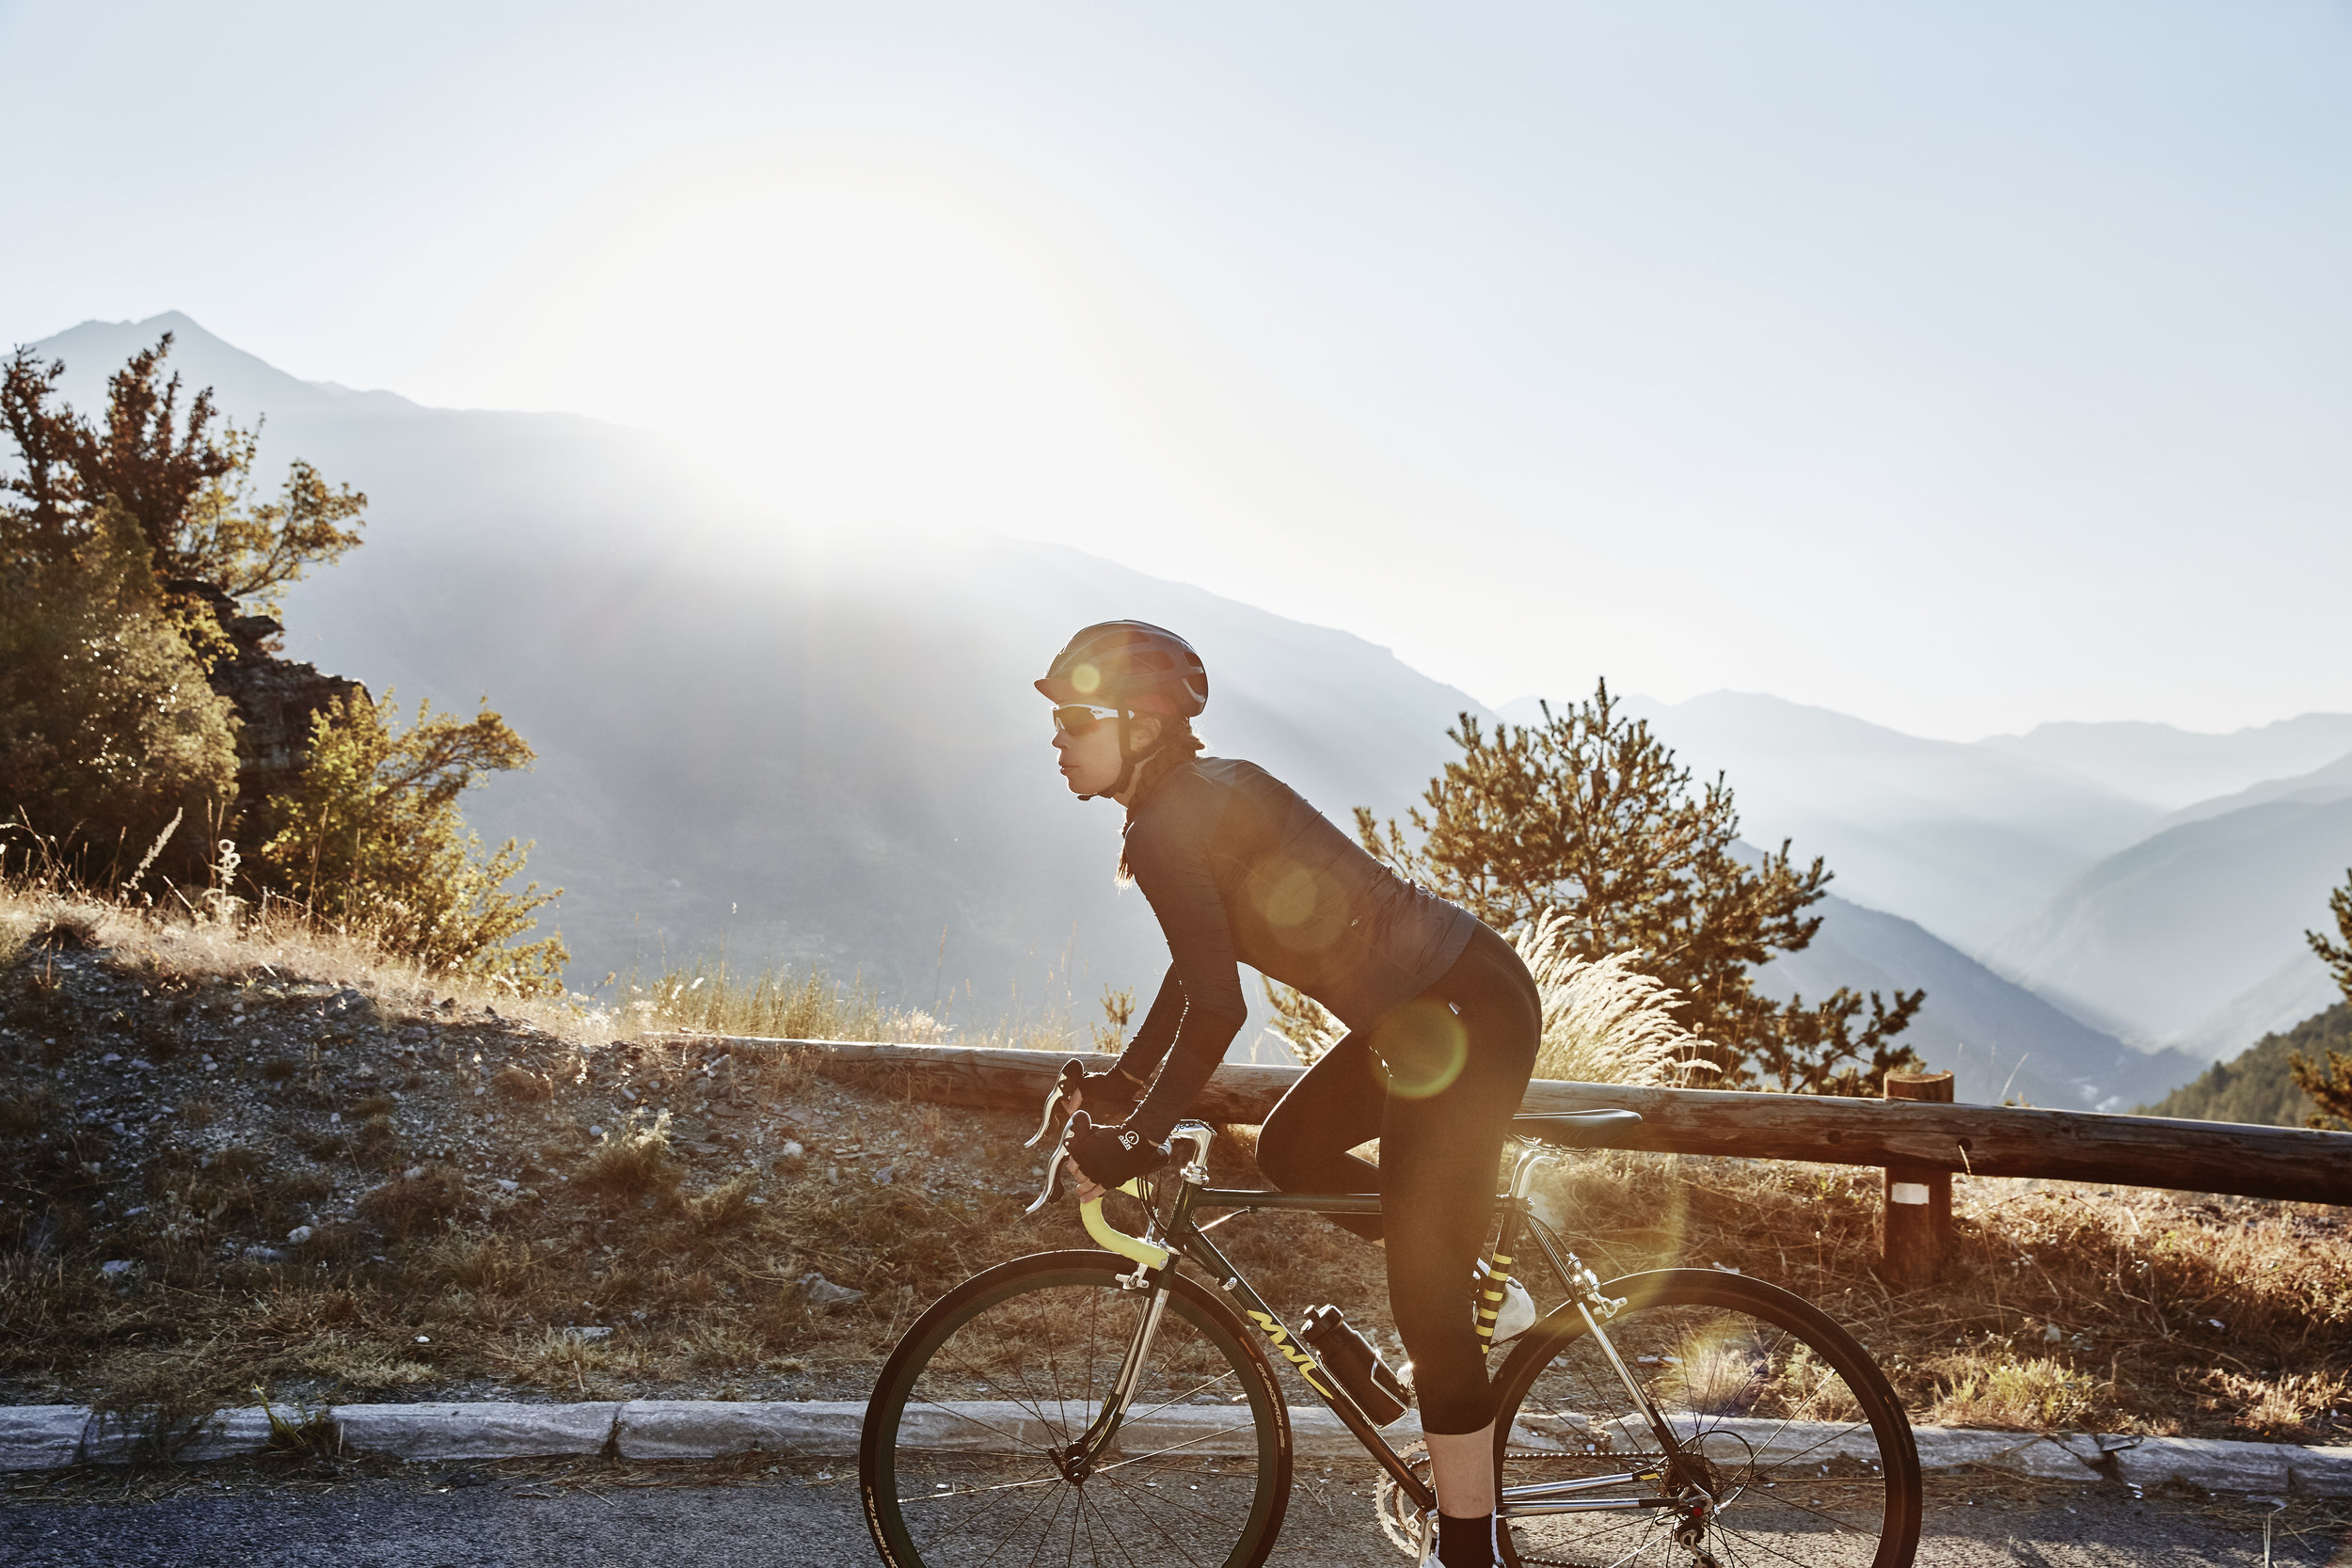 vulpine nick hussey woman cycling style apparel road racing cool.jpg